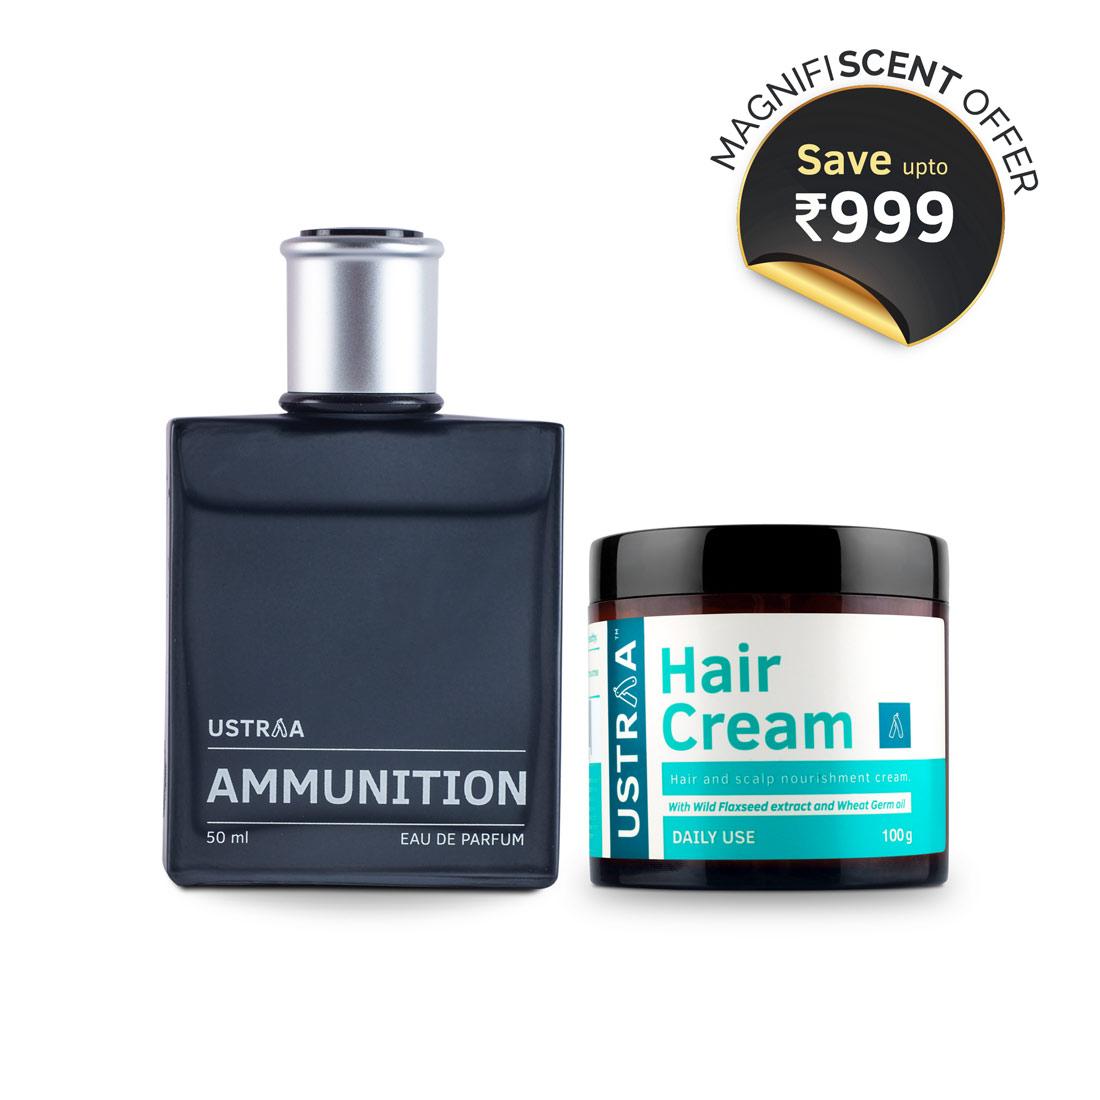 Magnifi-Scent - EDP Ammunition & Hair Cream Daily Use